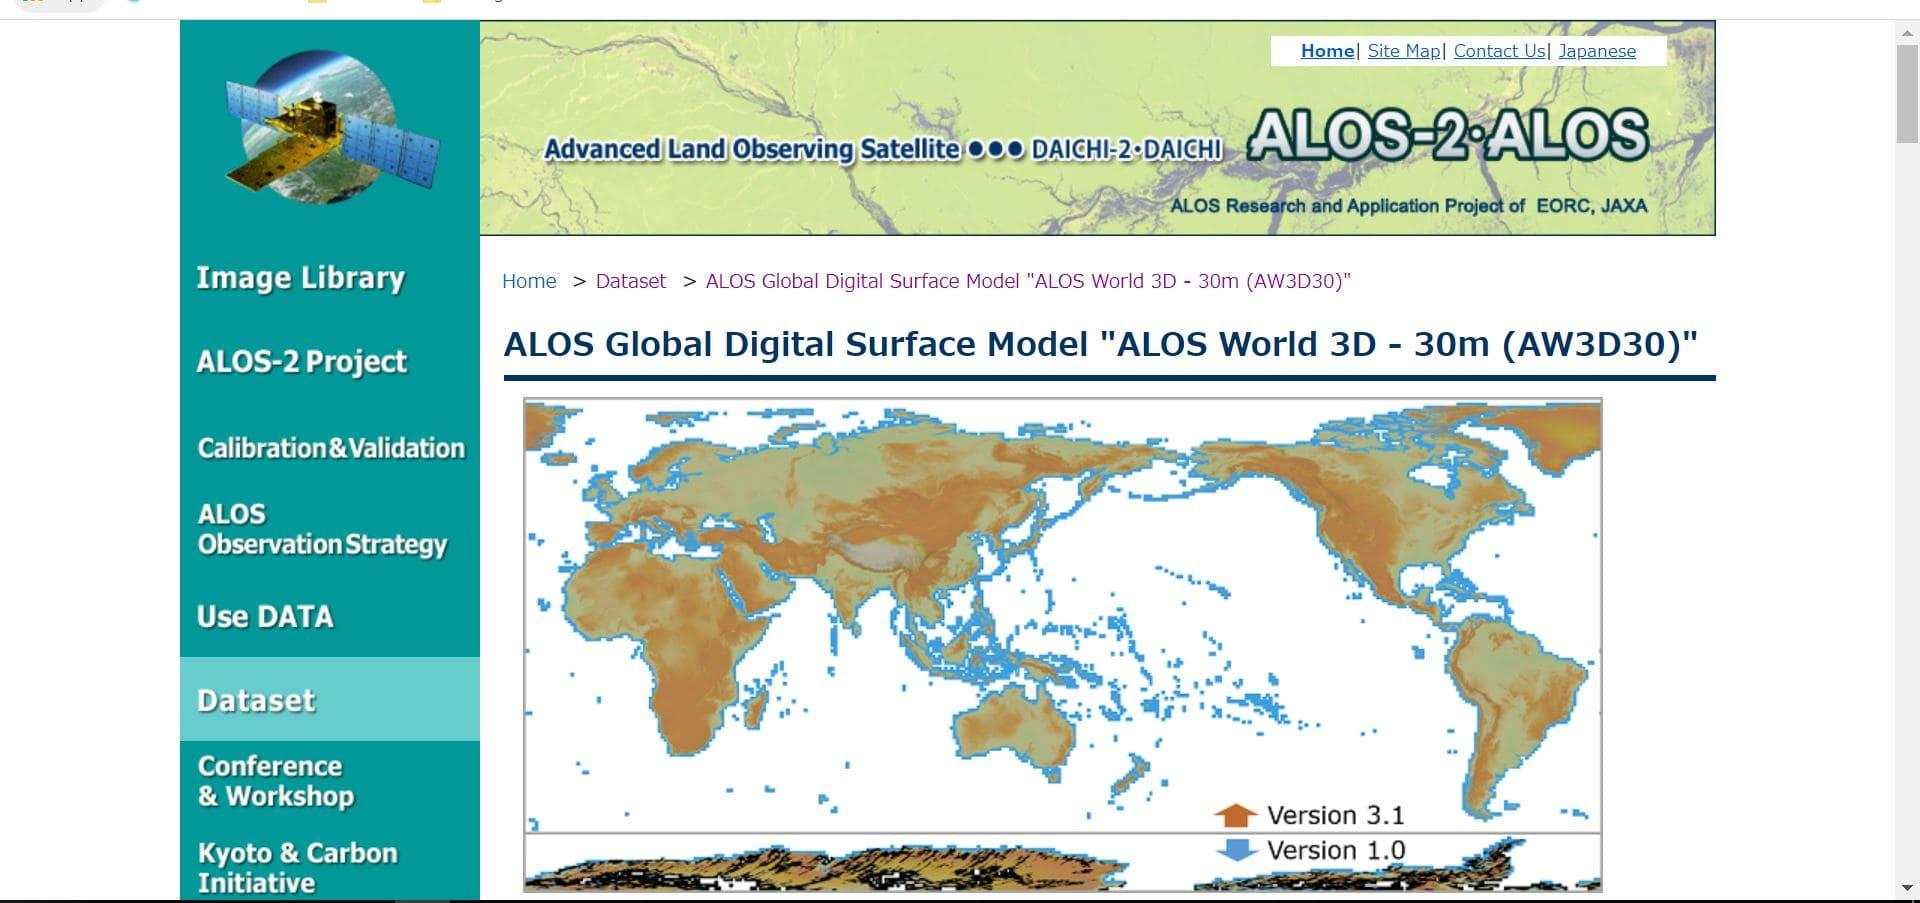 دانلود تصاویر Global ALOS